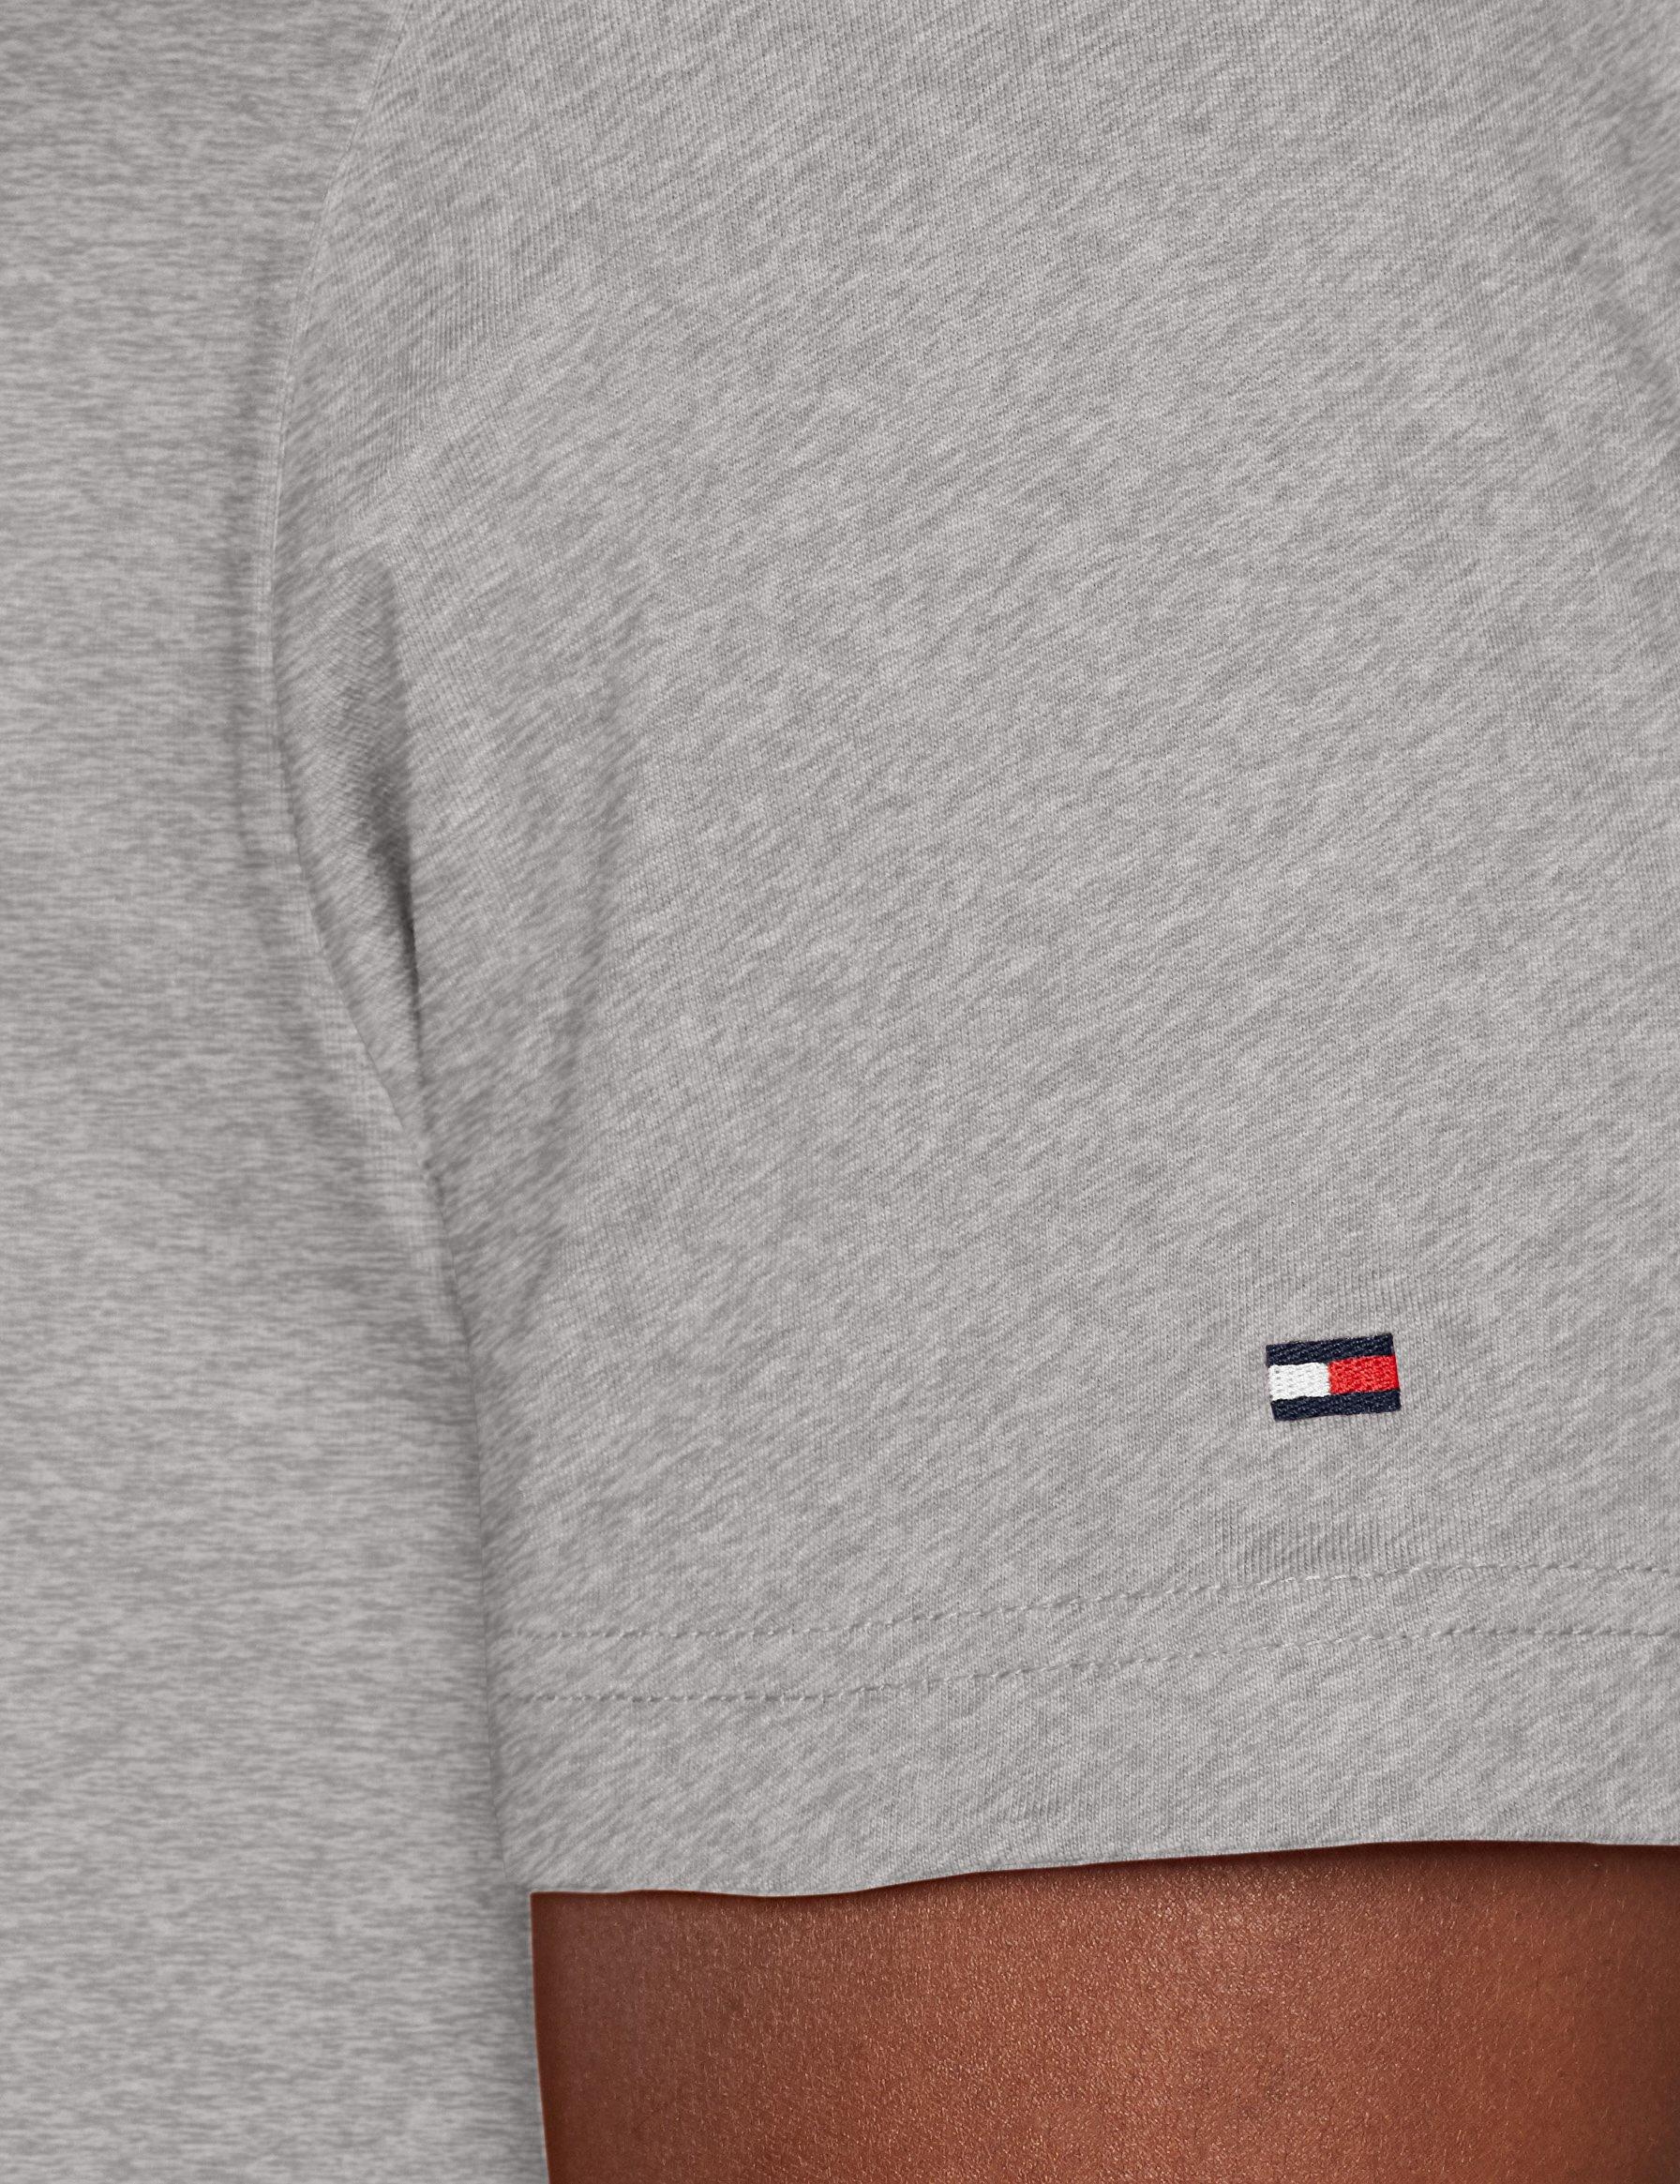 Tommy Hilfiger Logo Graphic tee Camiseta para Hombre